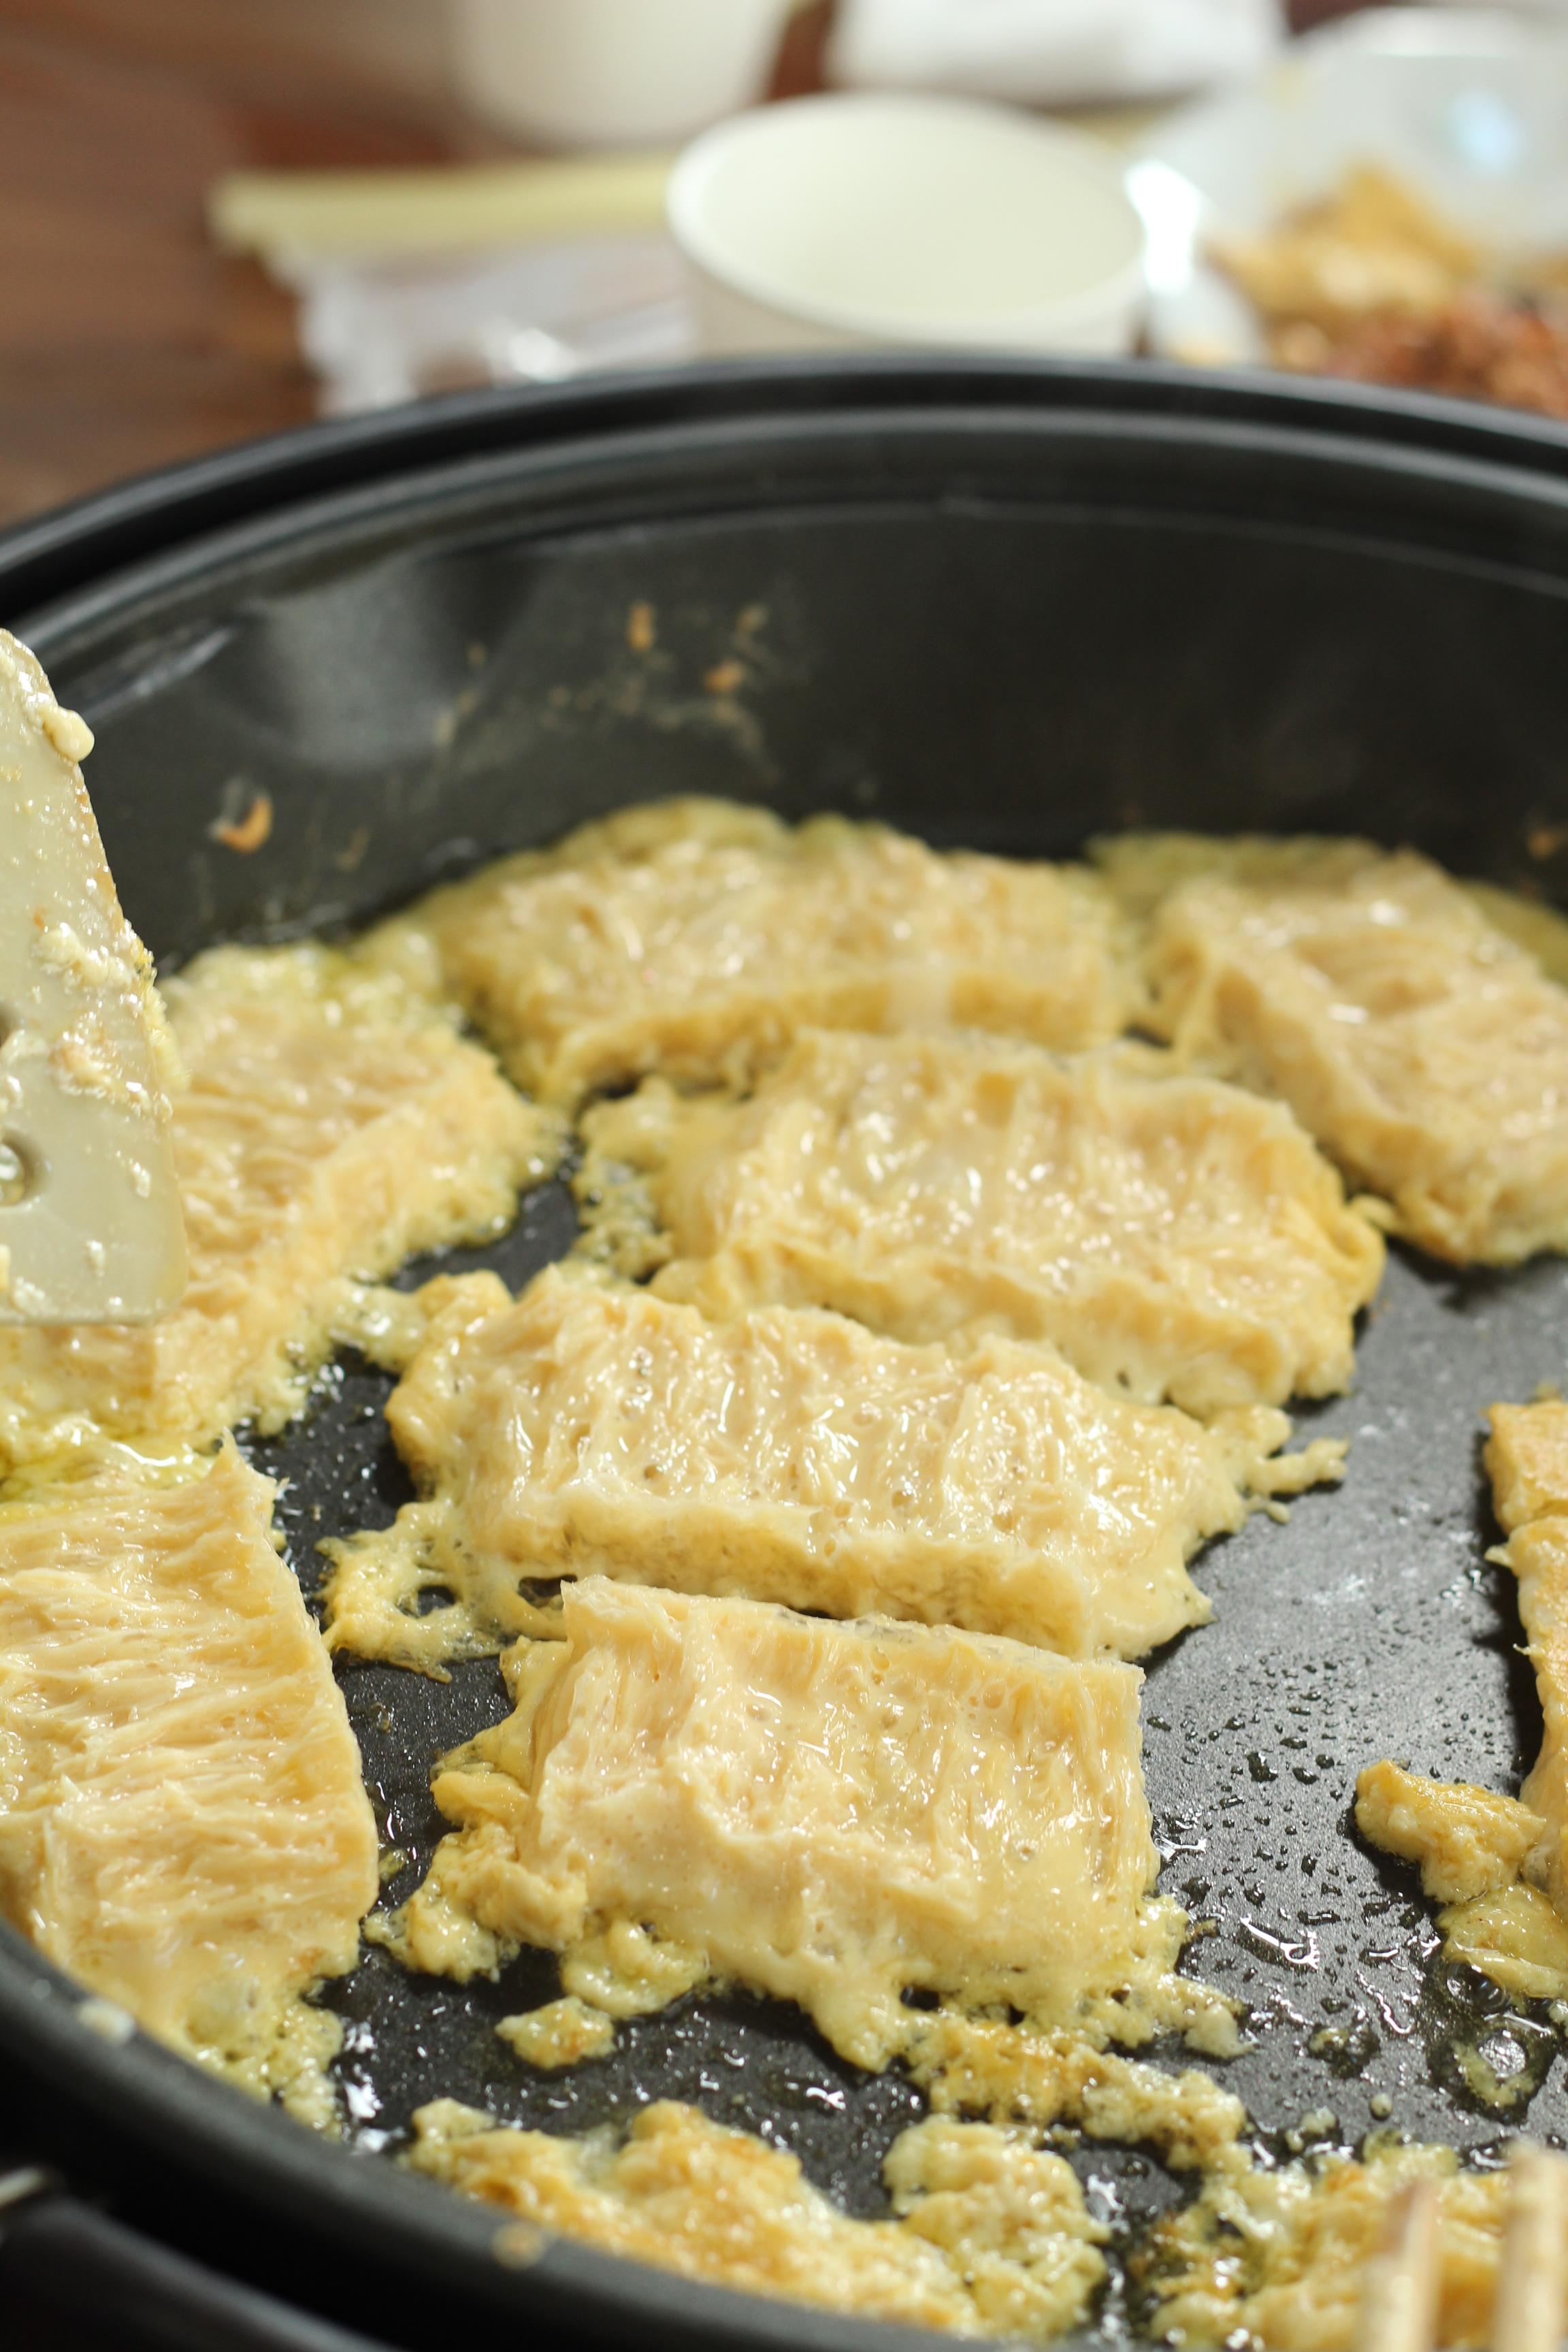 a-ta-sante糖質制限パン料理教室。阿倍野区西田辺。京都江部粉。山陰出張、たがしゅう先生オフ会後のお料理。